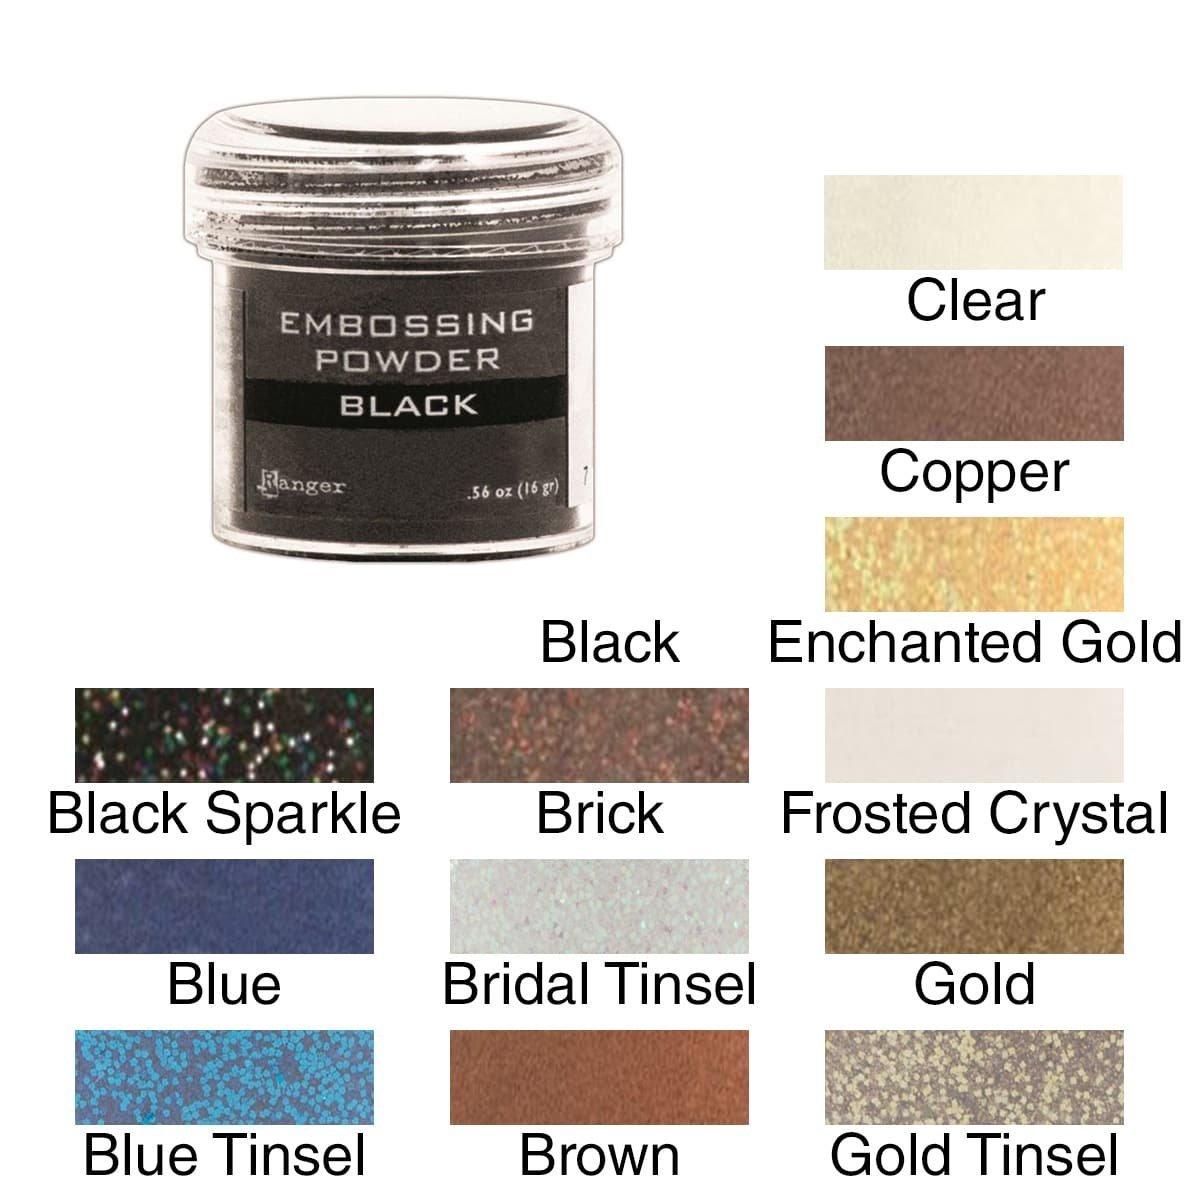 Ranger Embossing Powder Blue Tinsel 1-Ounce Jar